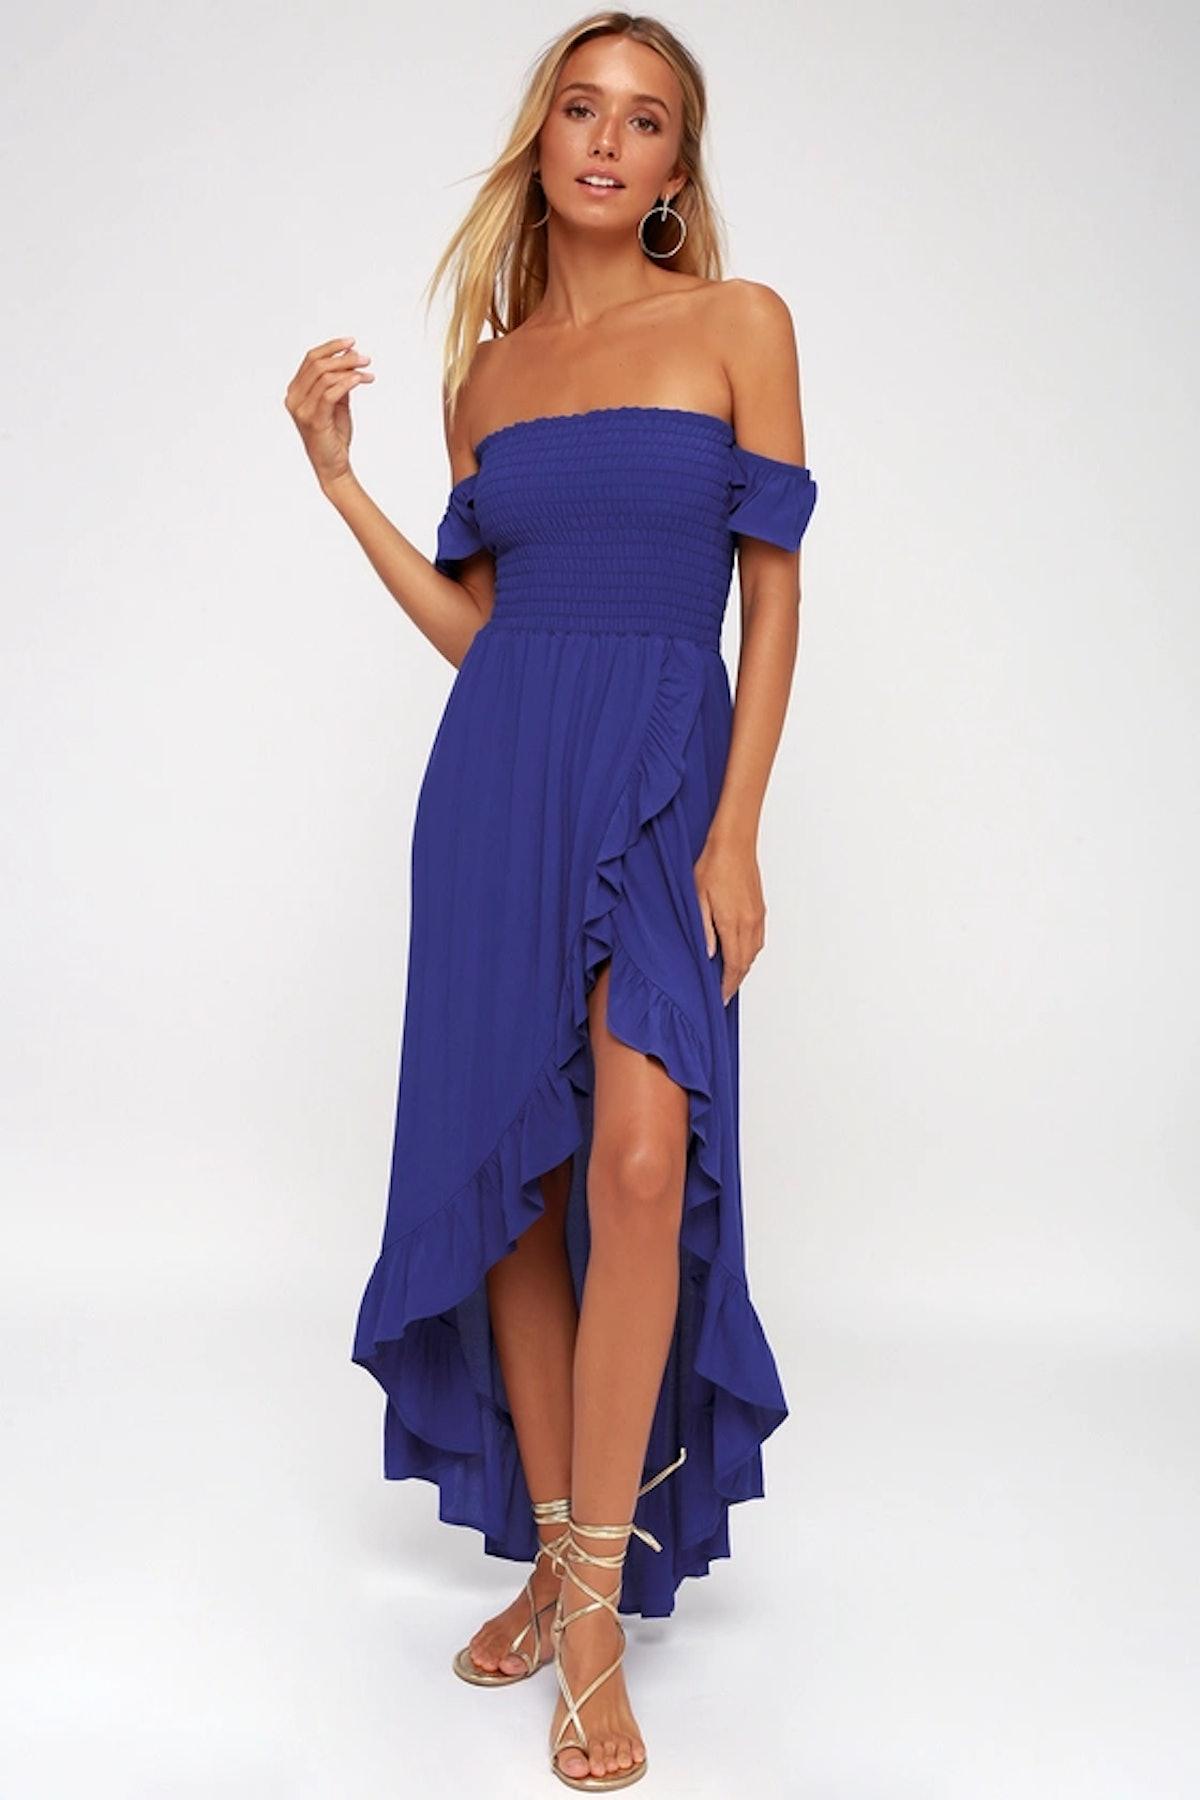 Wild Hearts Royal Blue Off-The-Shoulder Dress